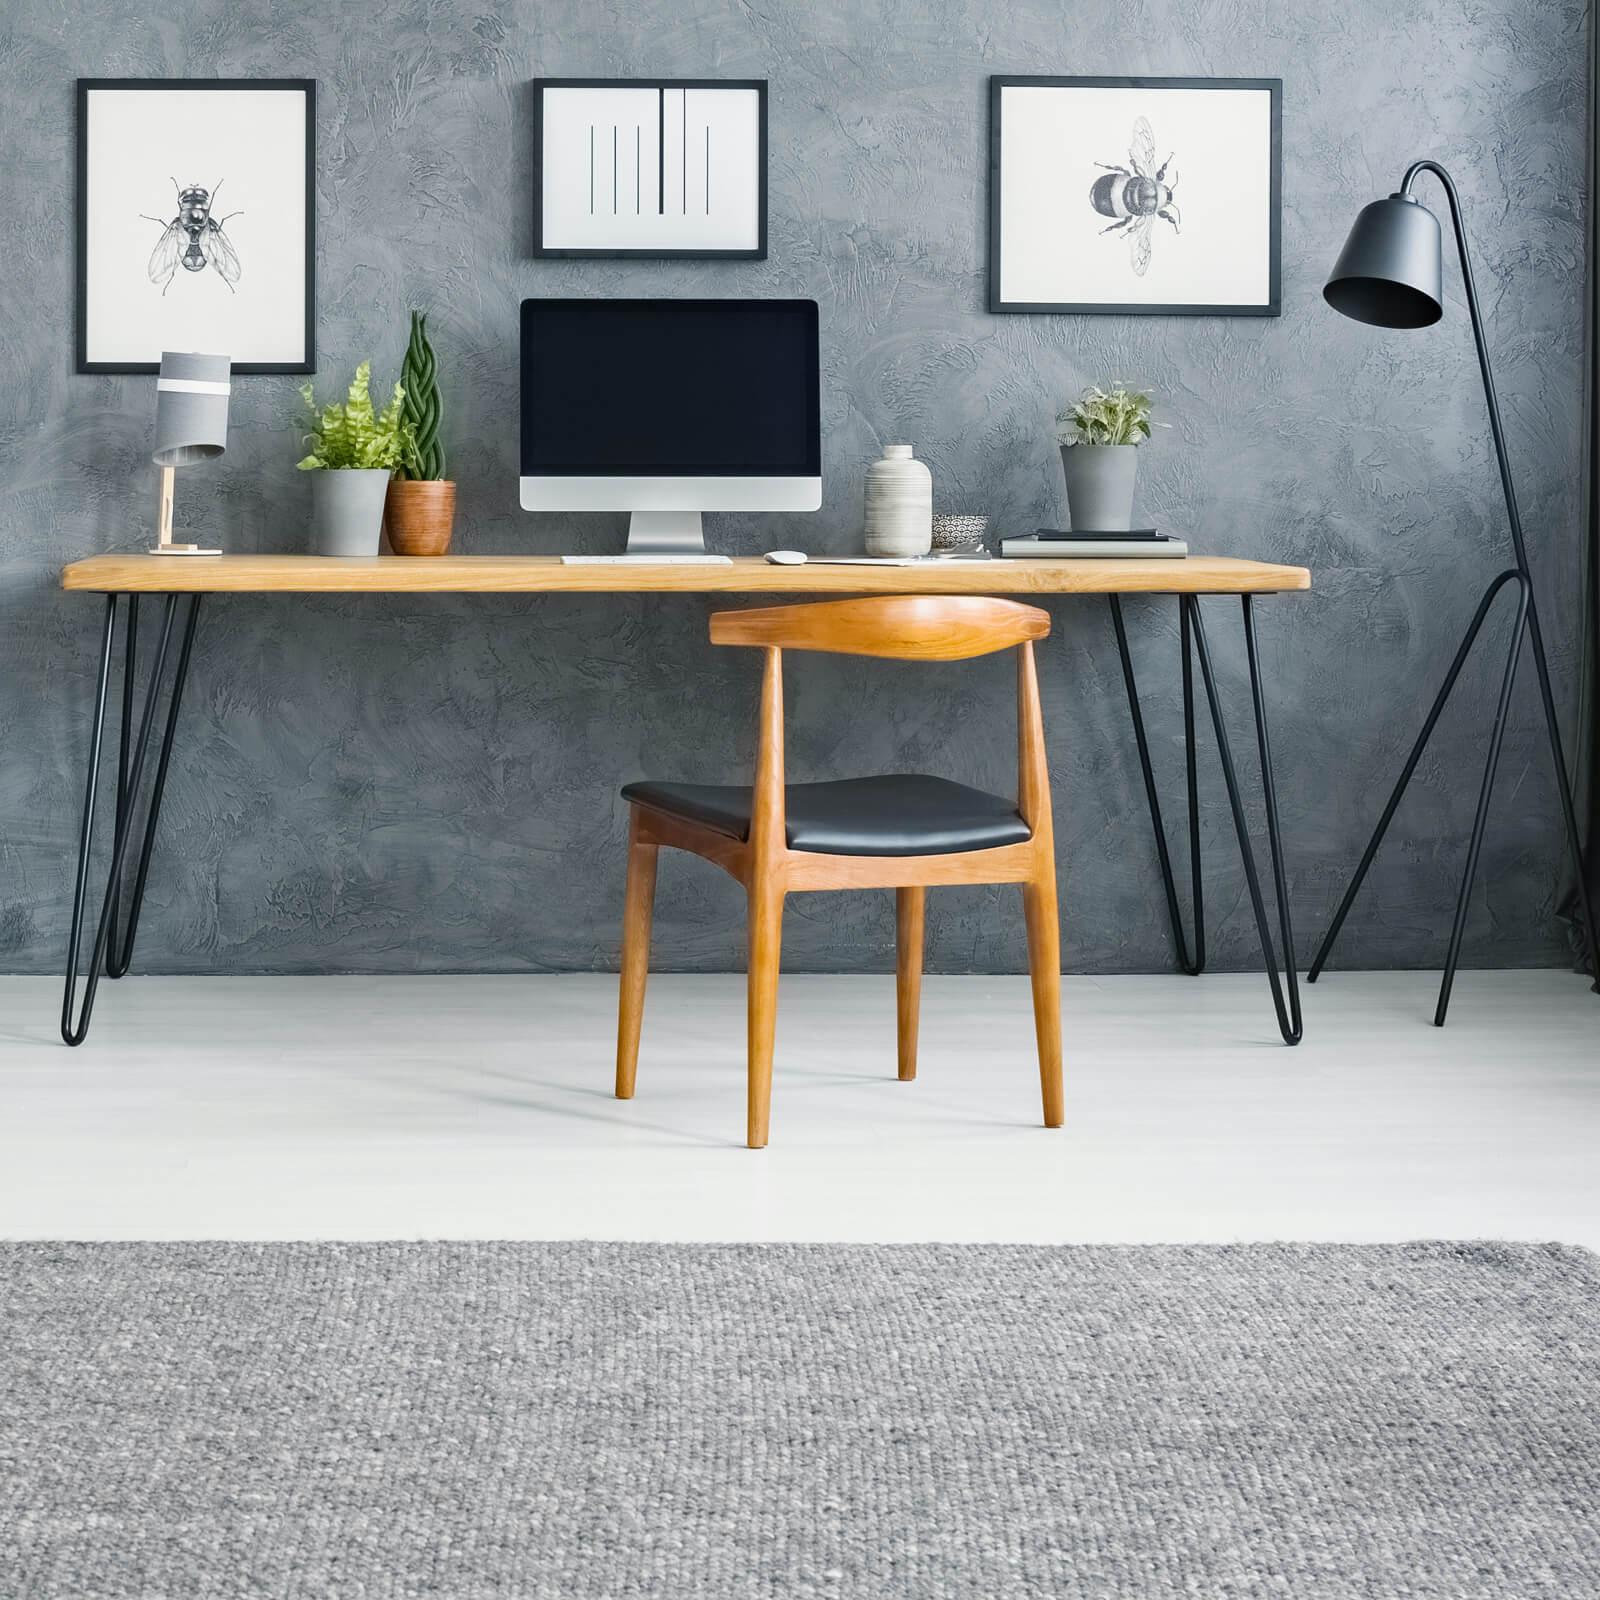 custom-rug-grey-1600x1600